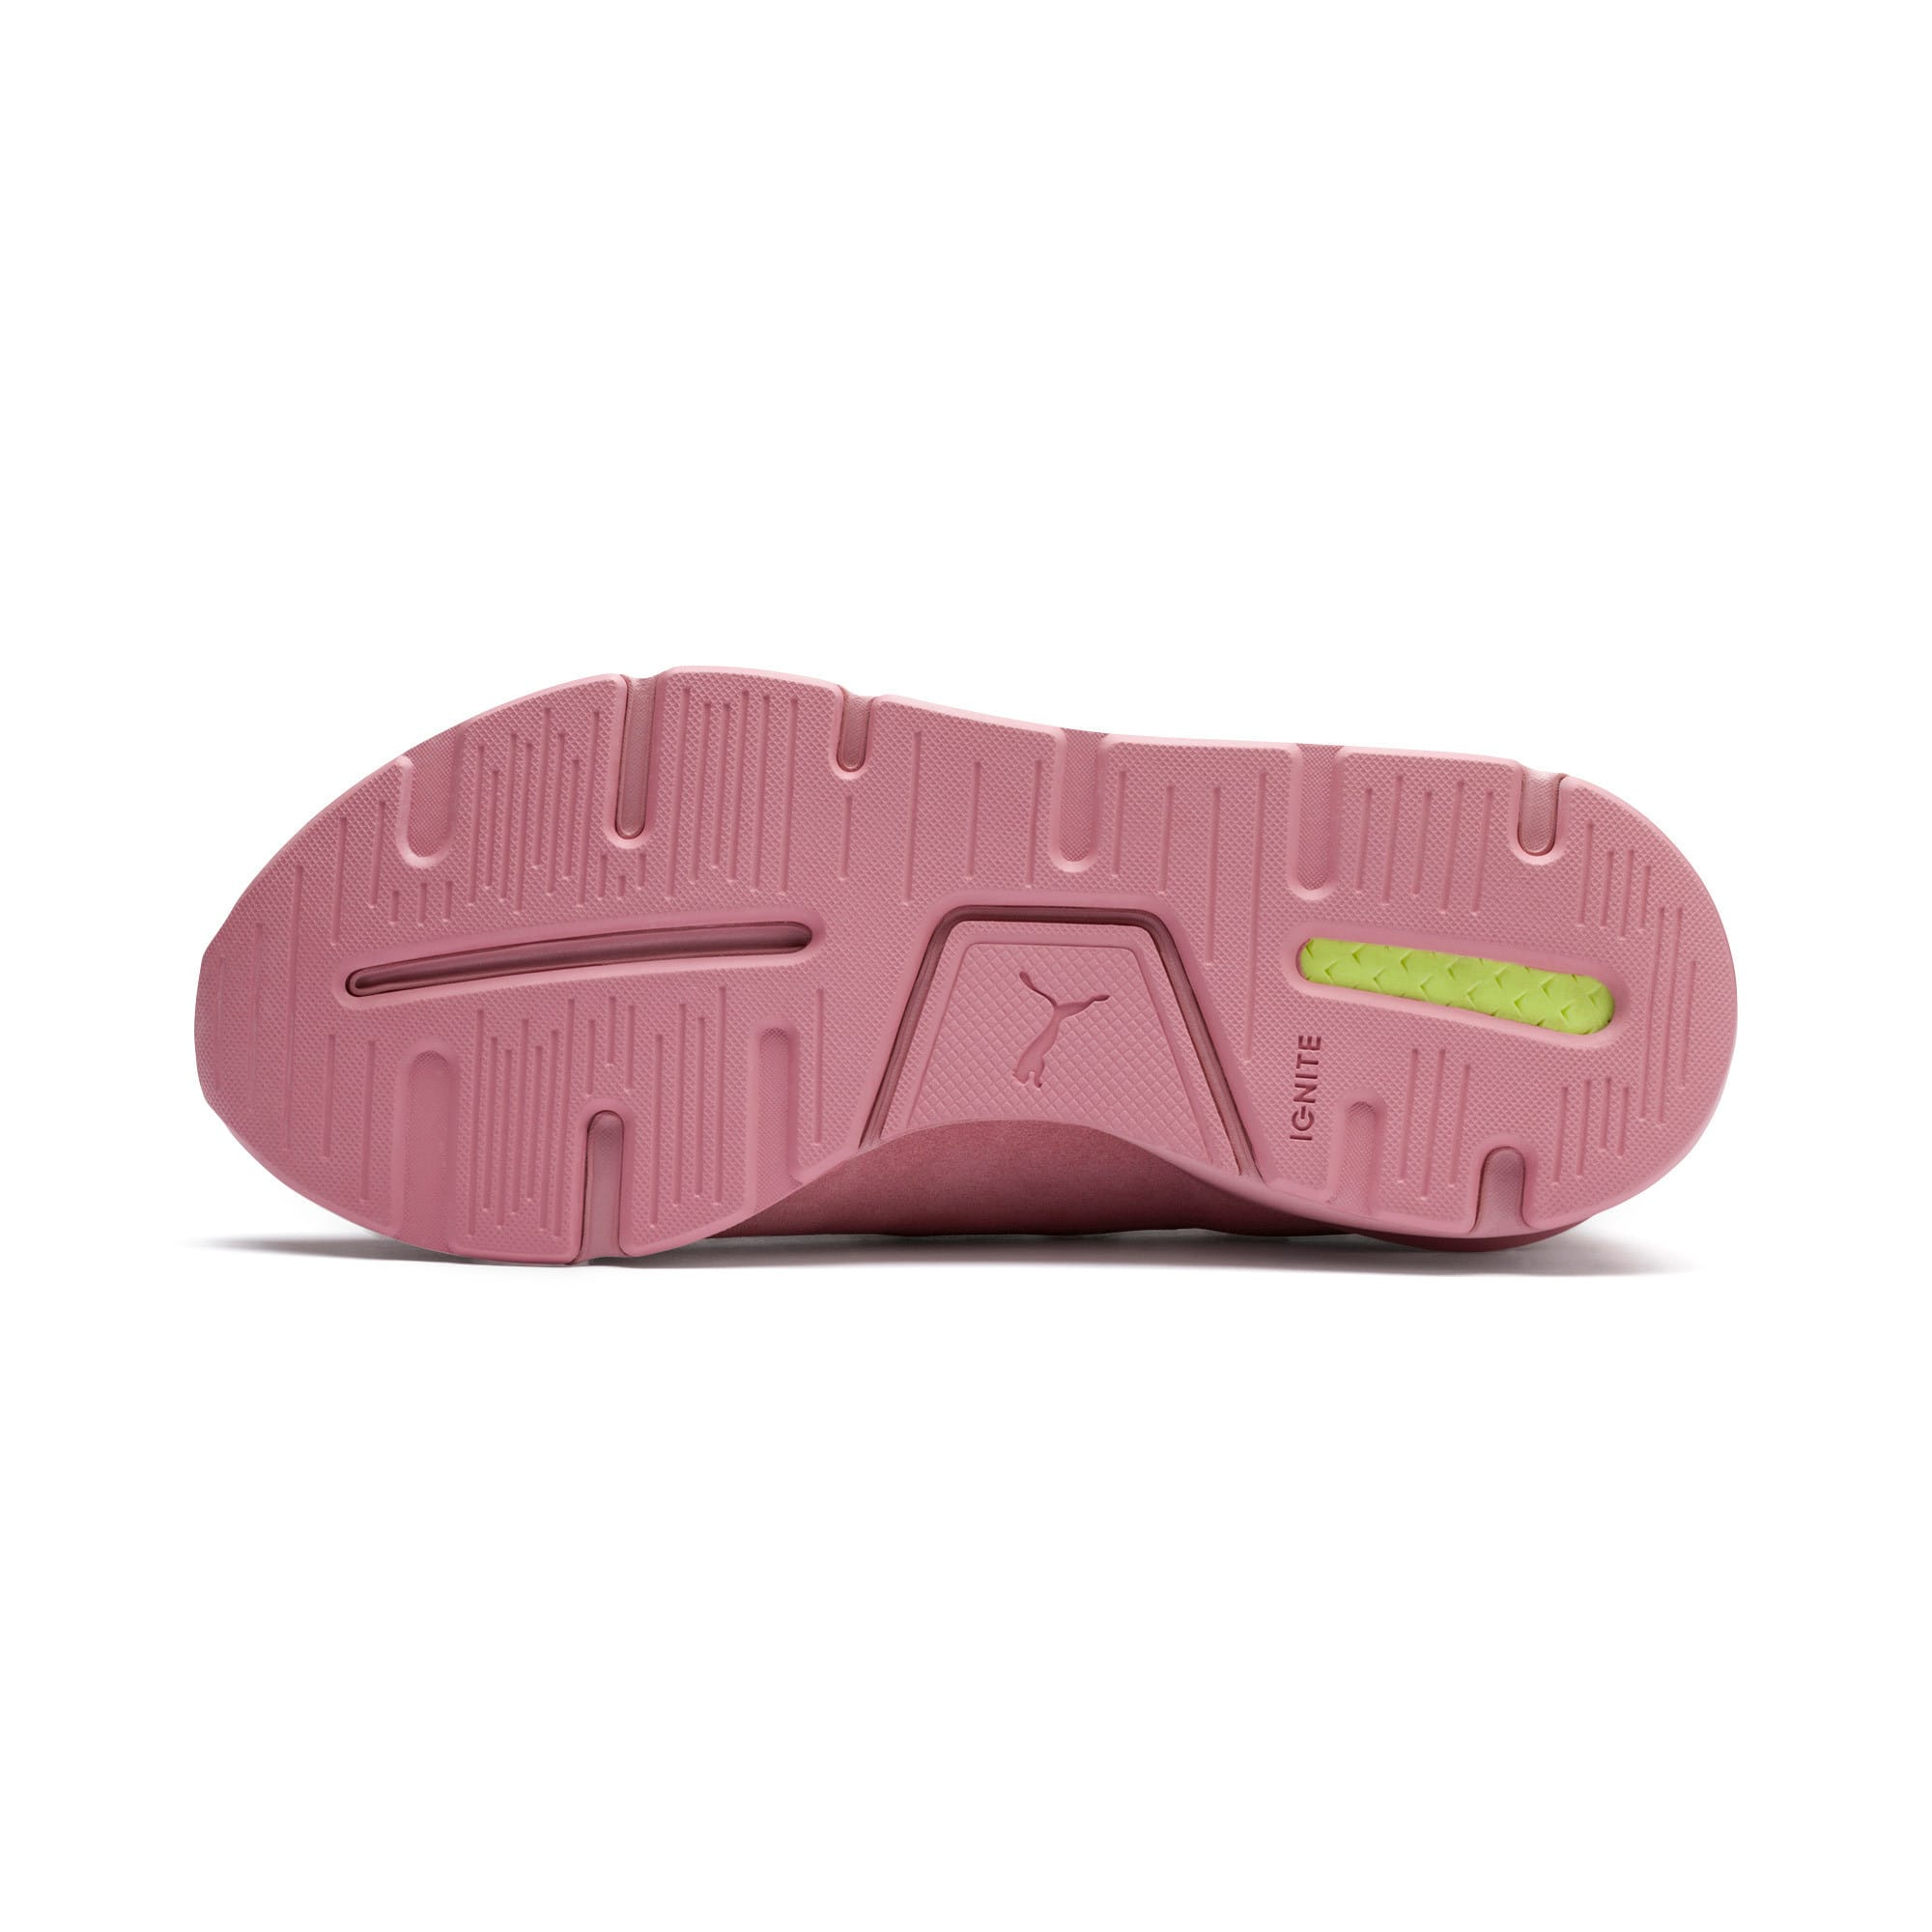 Miniatura 3 de Zapatos deportivos Muse 2 para mujer, Bridal Rose-Bridal Rose, mediano